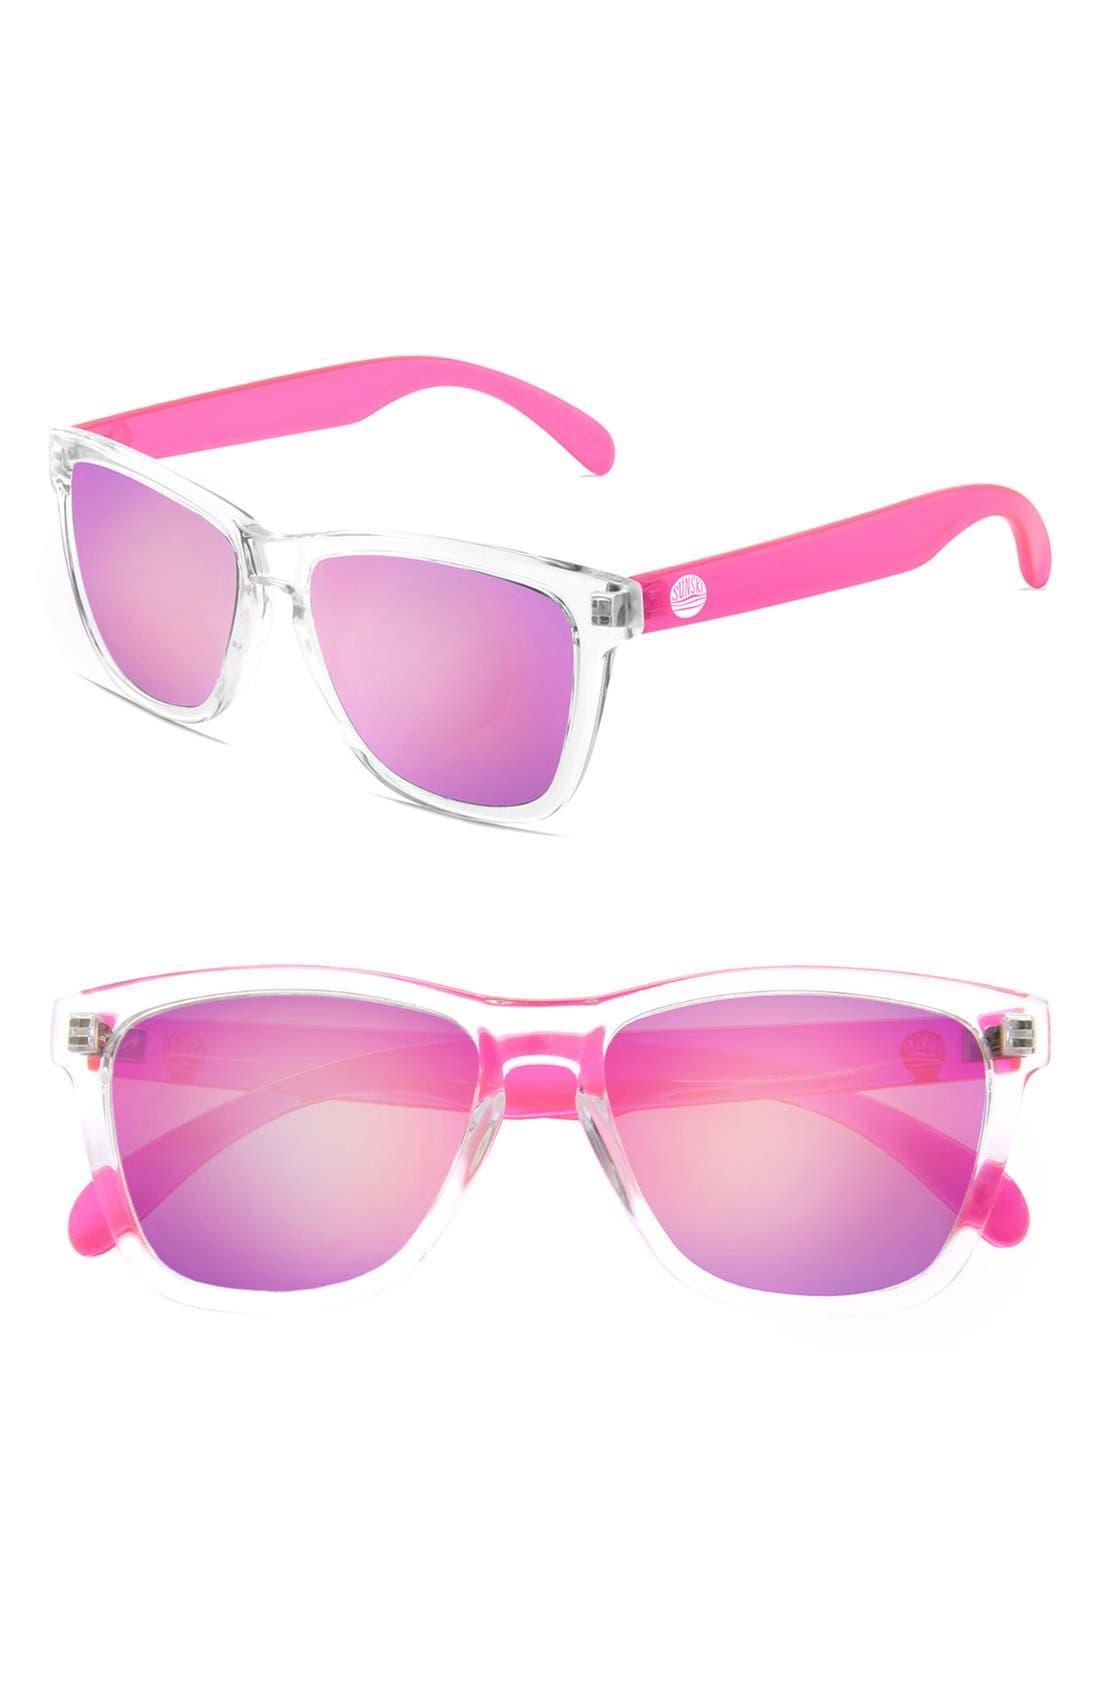 Alternate Image 1 Selected - Sunski 'Originals' 53mm Retro Polarized Sunglasses